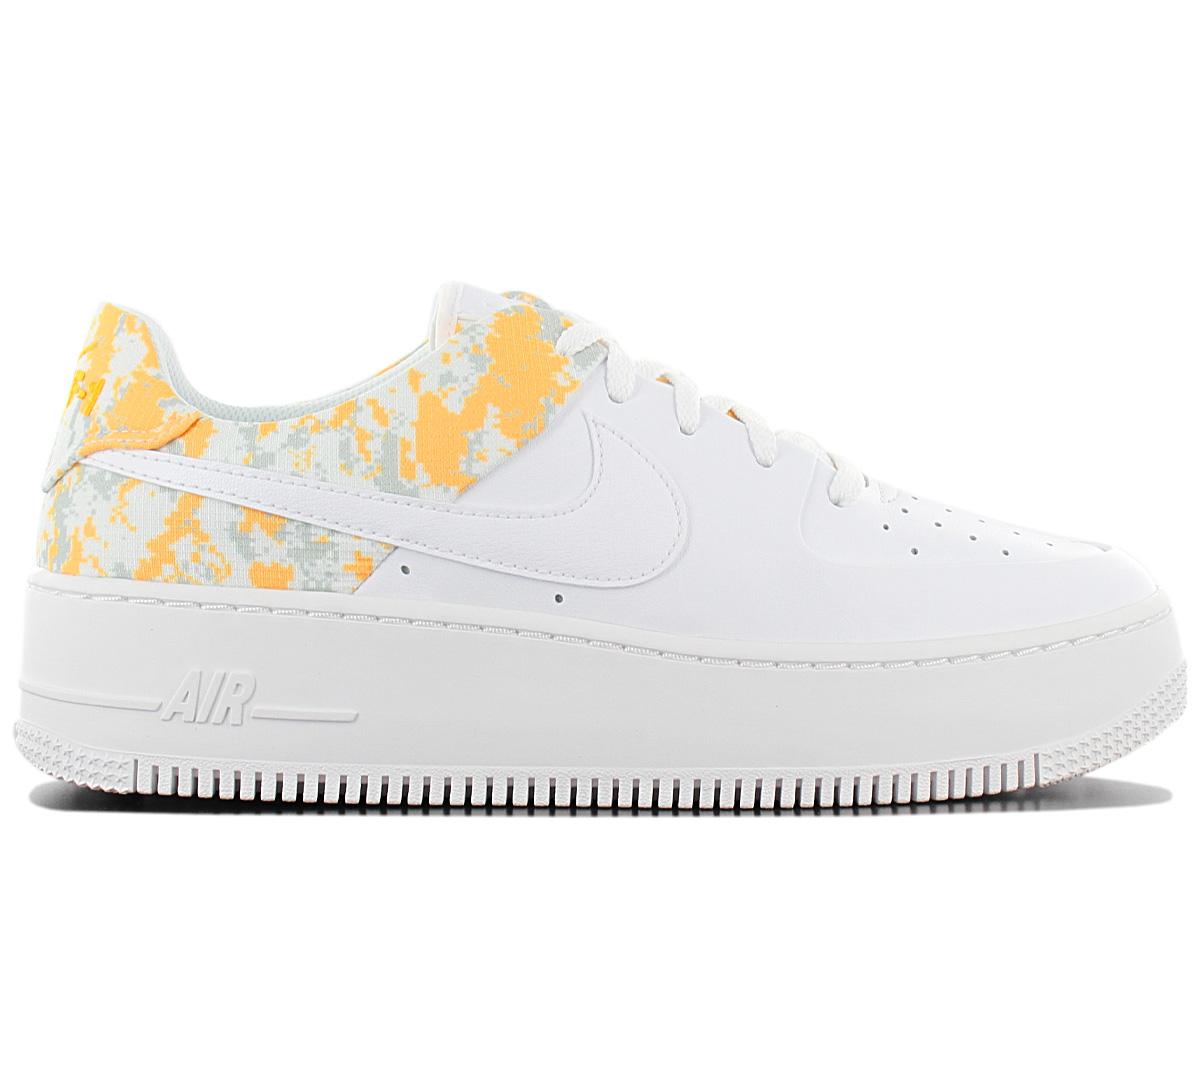 Details zu Nike Air Force 1 Sage Lo Premium Sneaker CI2673 100 Leder Weiß Fashion Schuh NEU